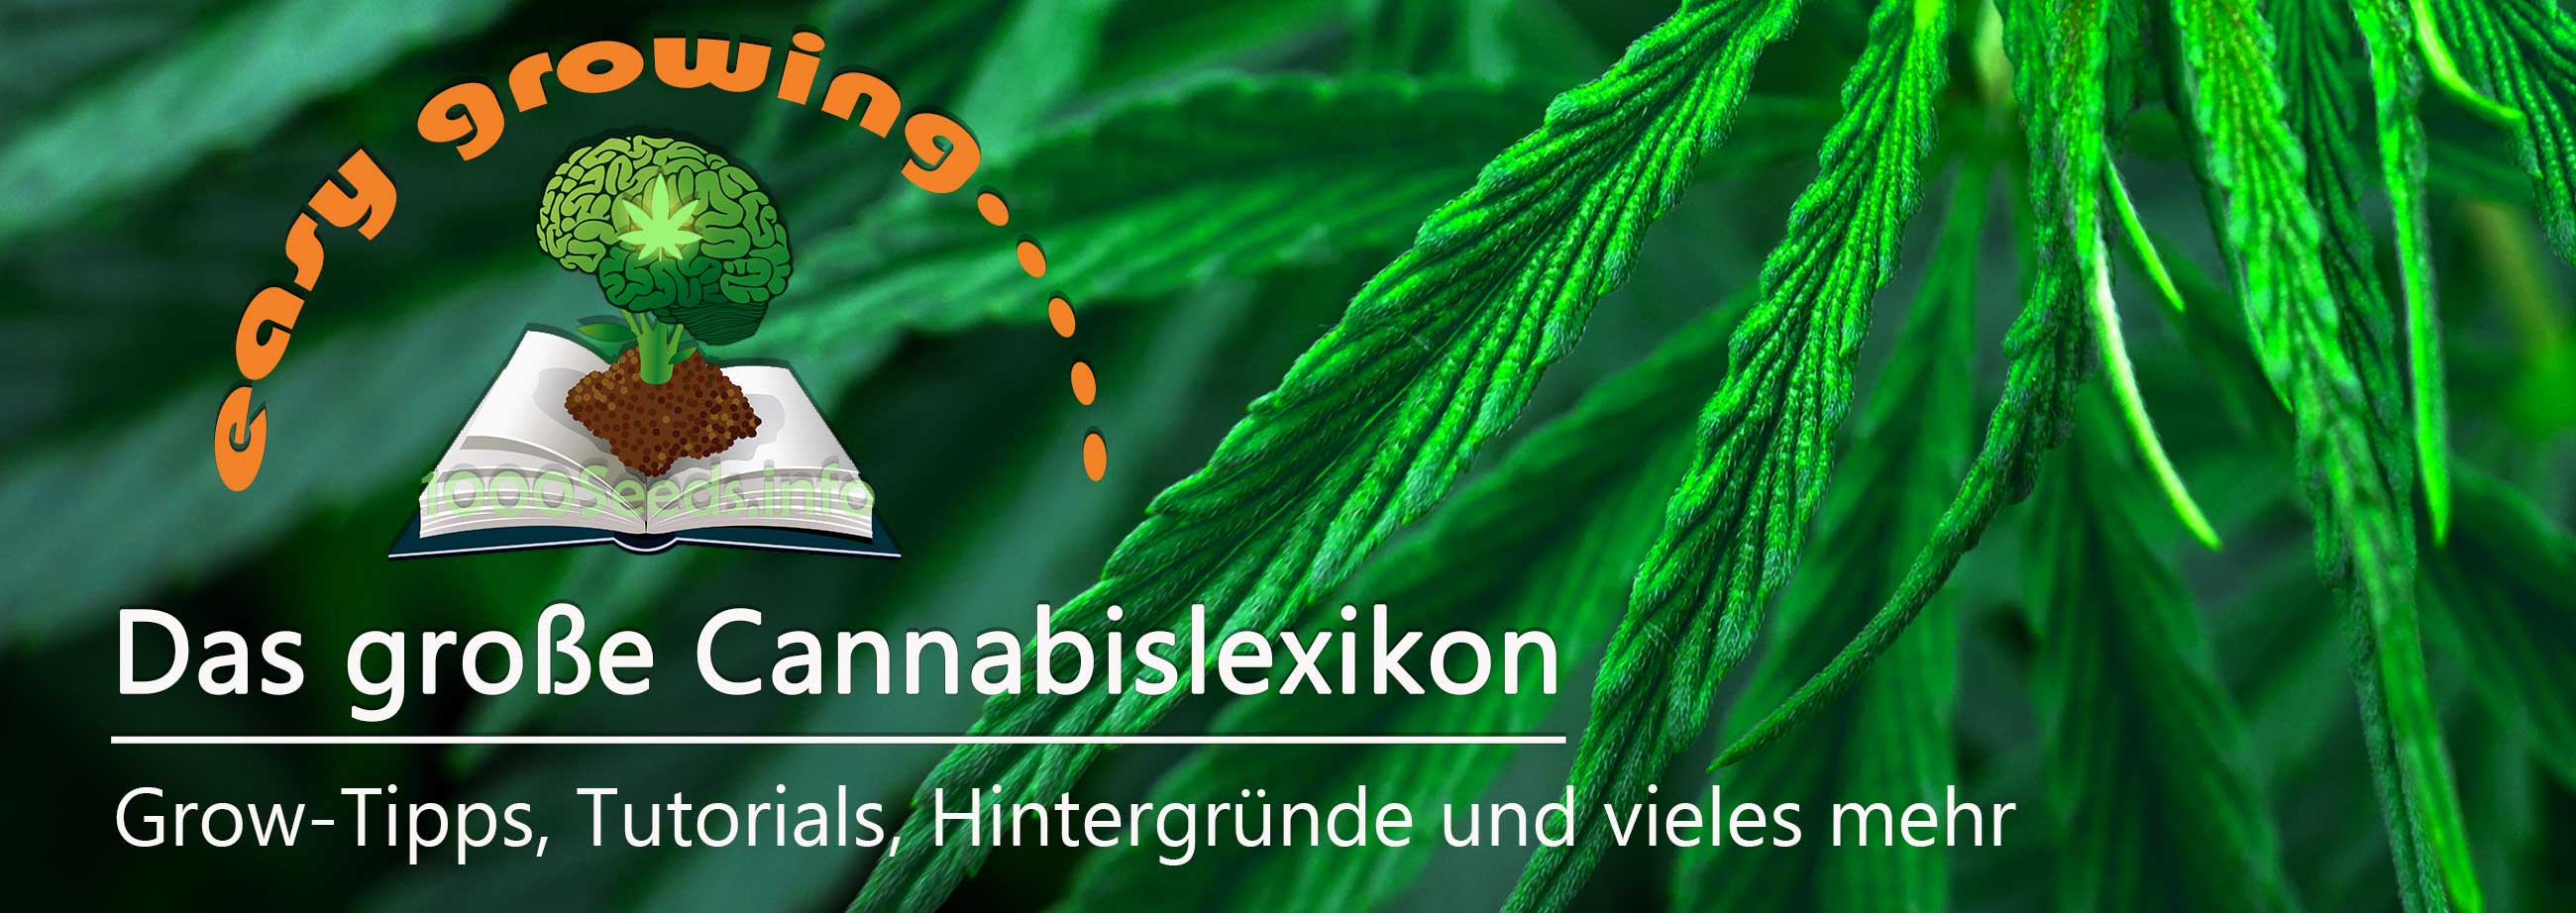 Cannabis-Lexikon